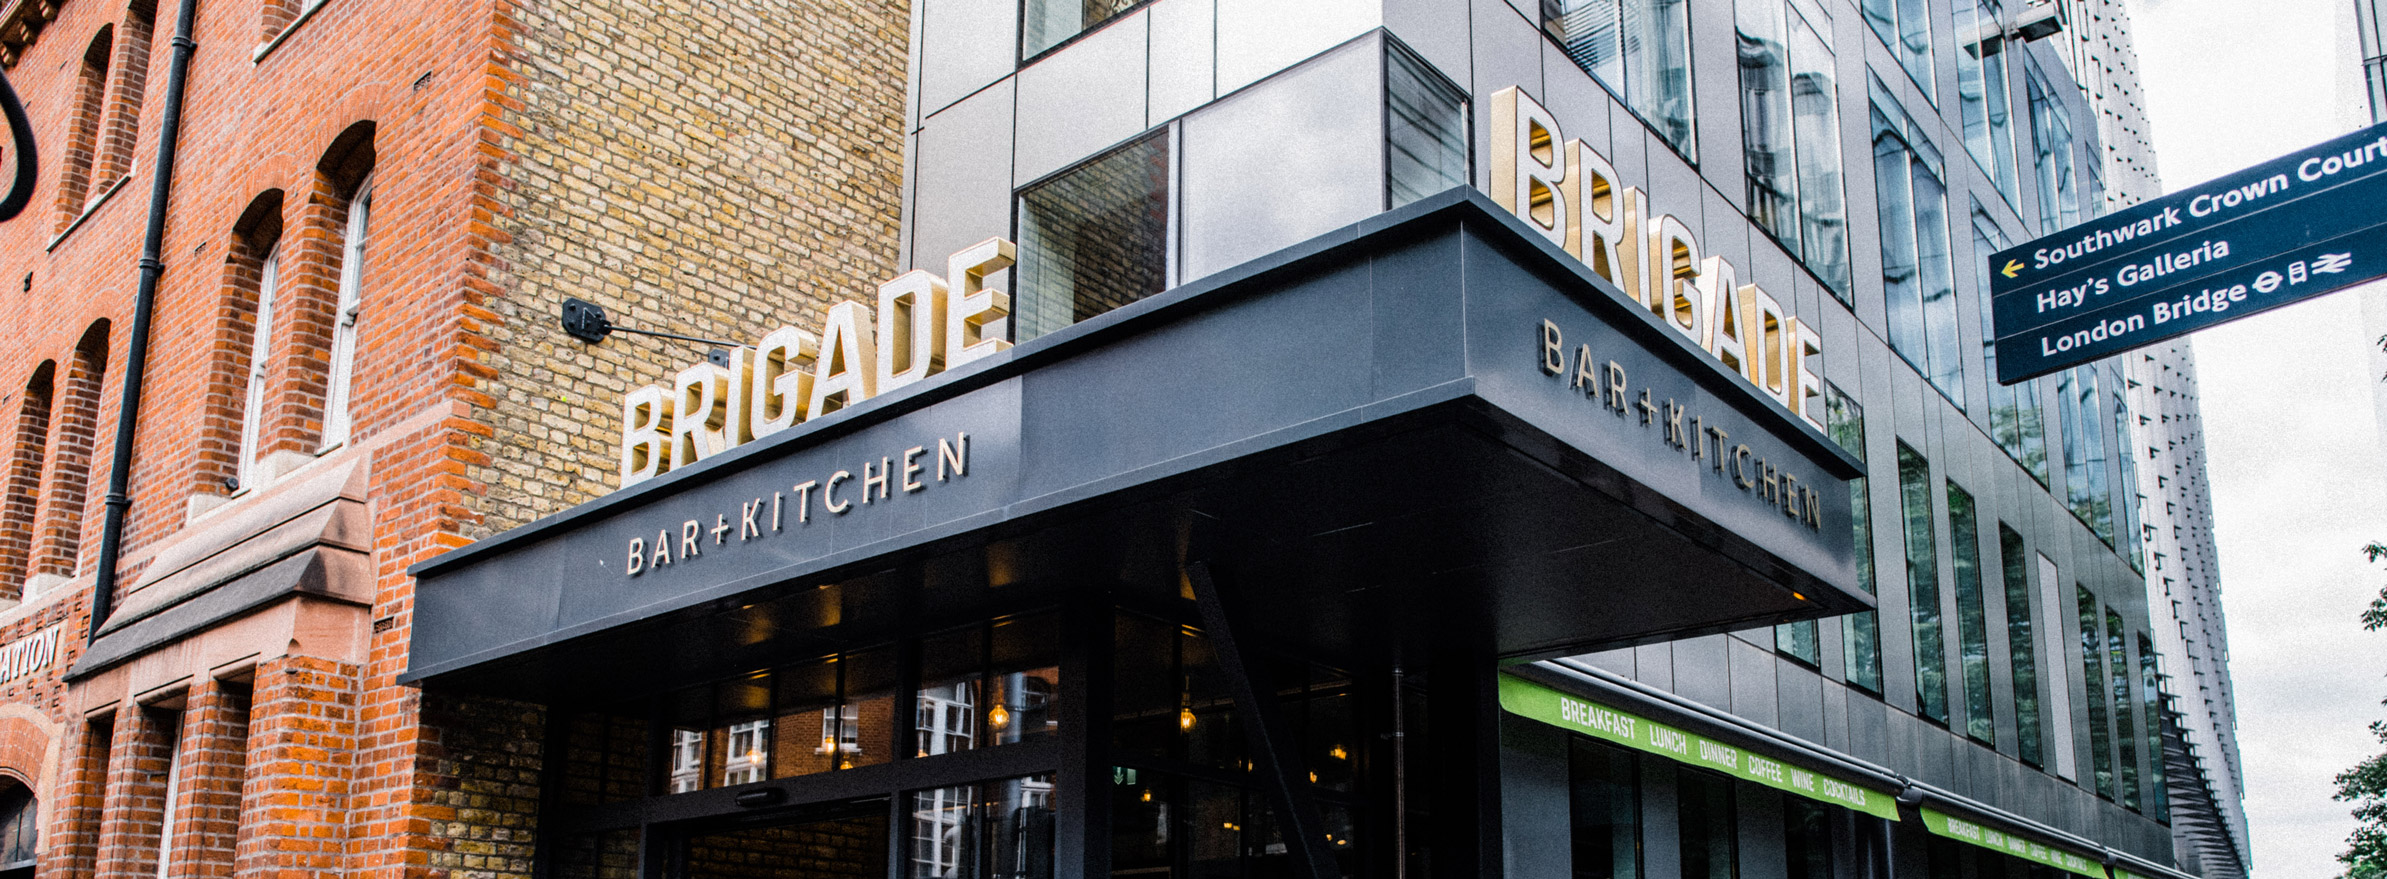 Contact us - Brigade Bar & Kitchen